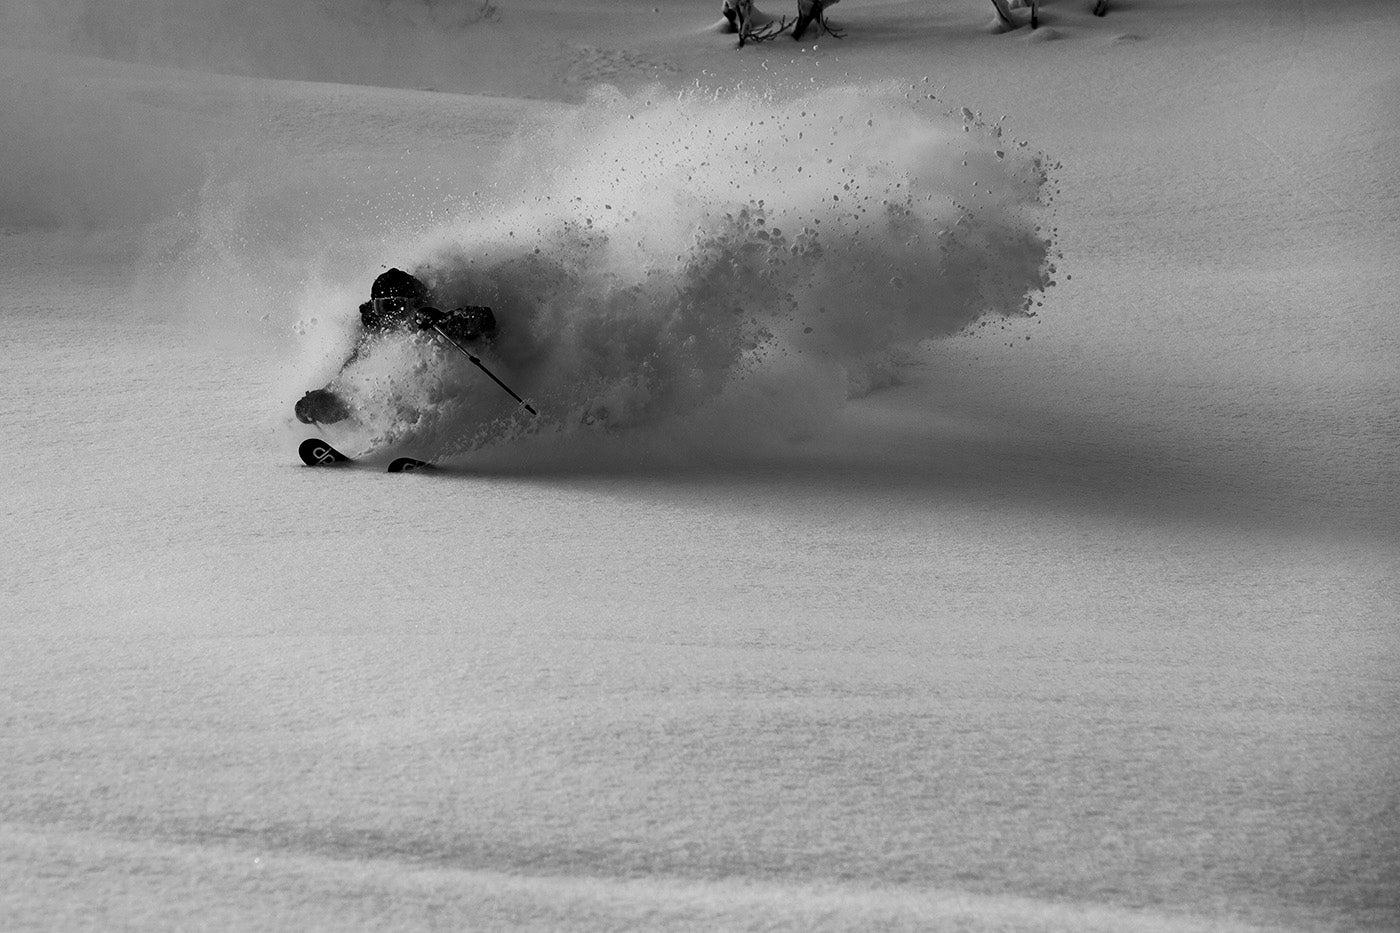 How To Ski Powder Like A Pro